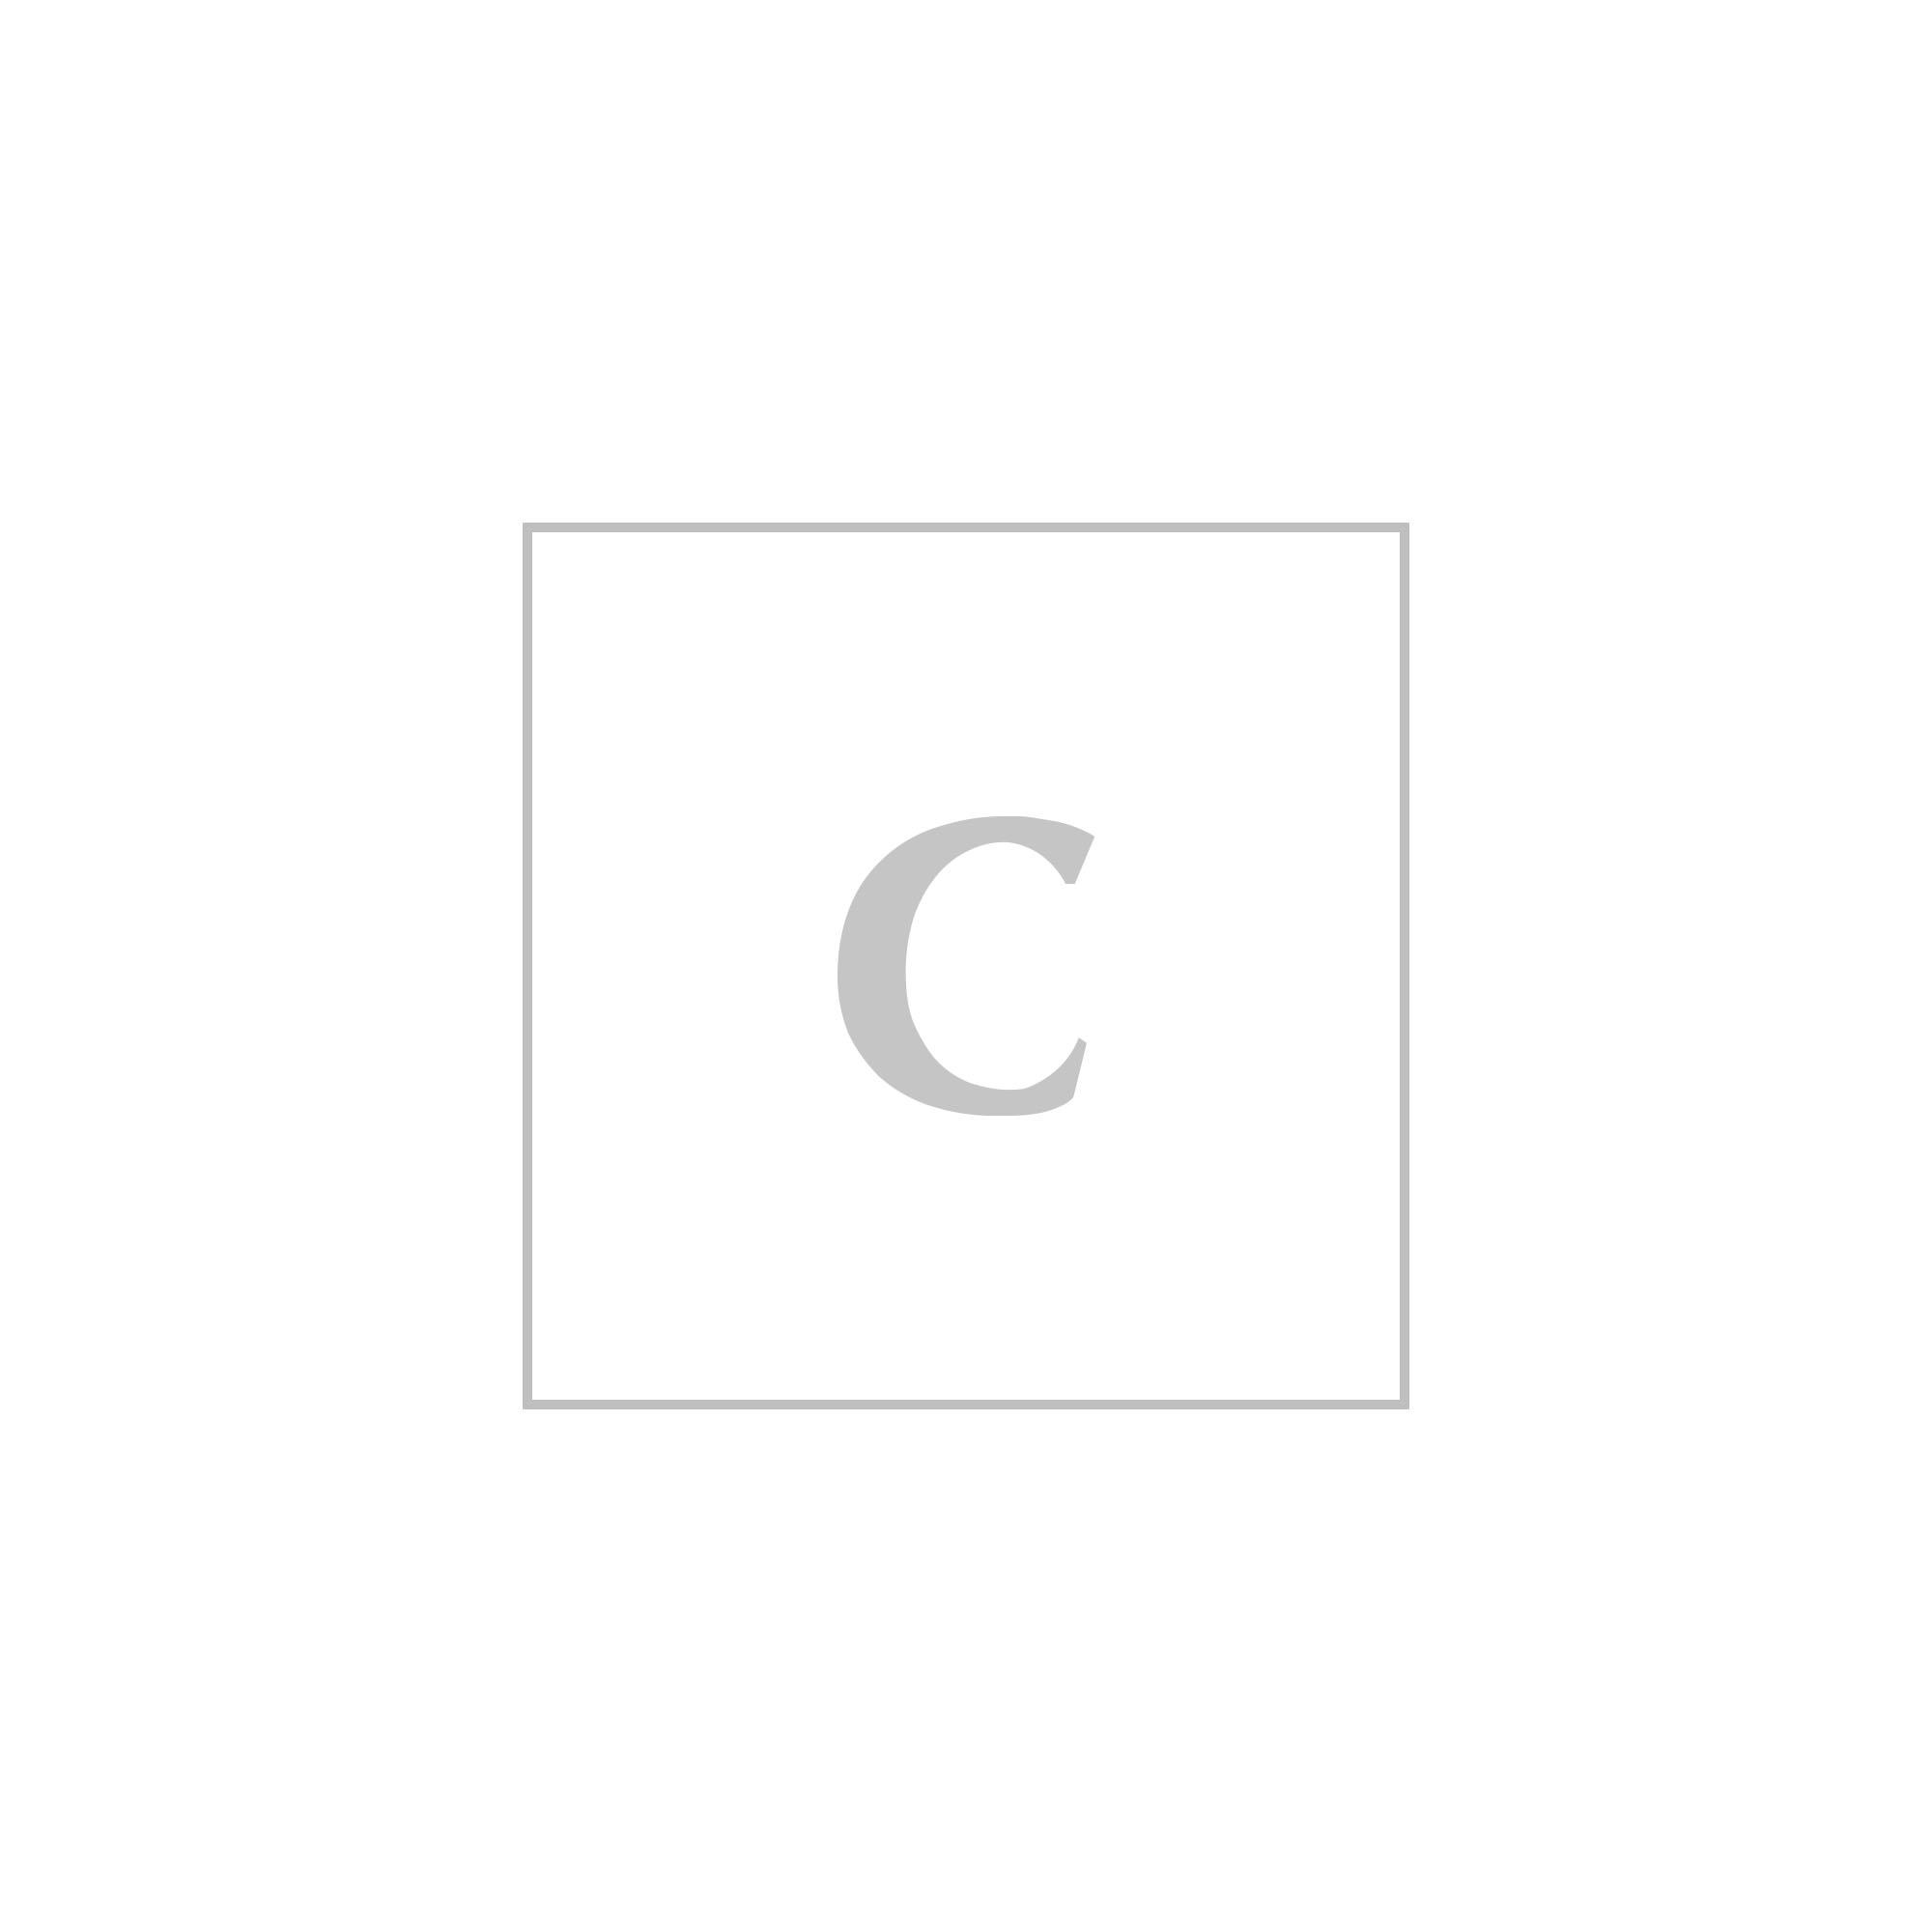 Cc collection corneliani three-piece suit